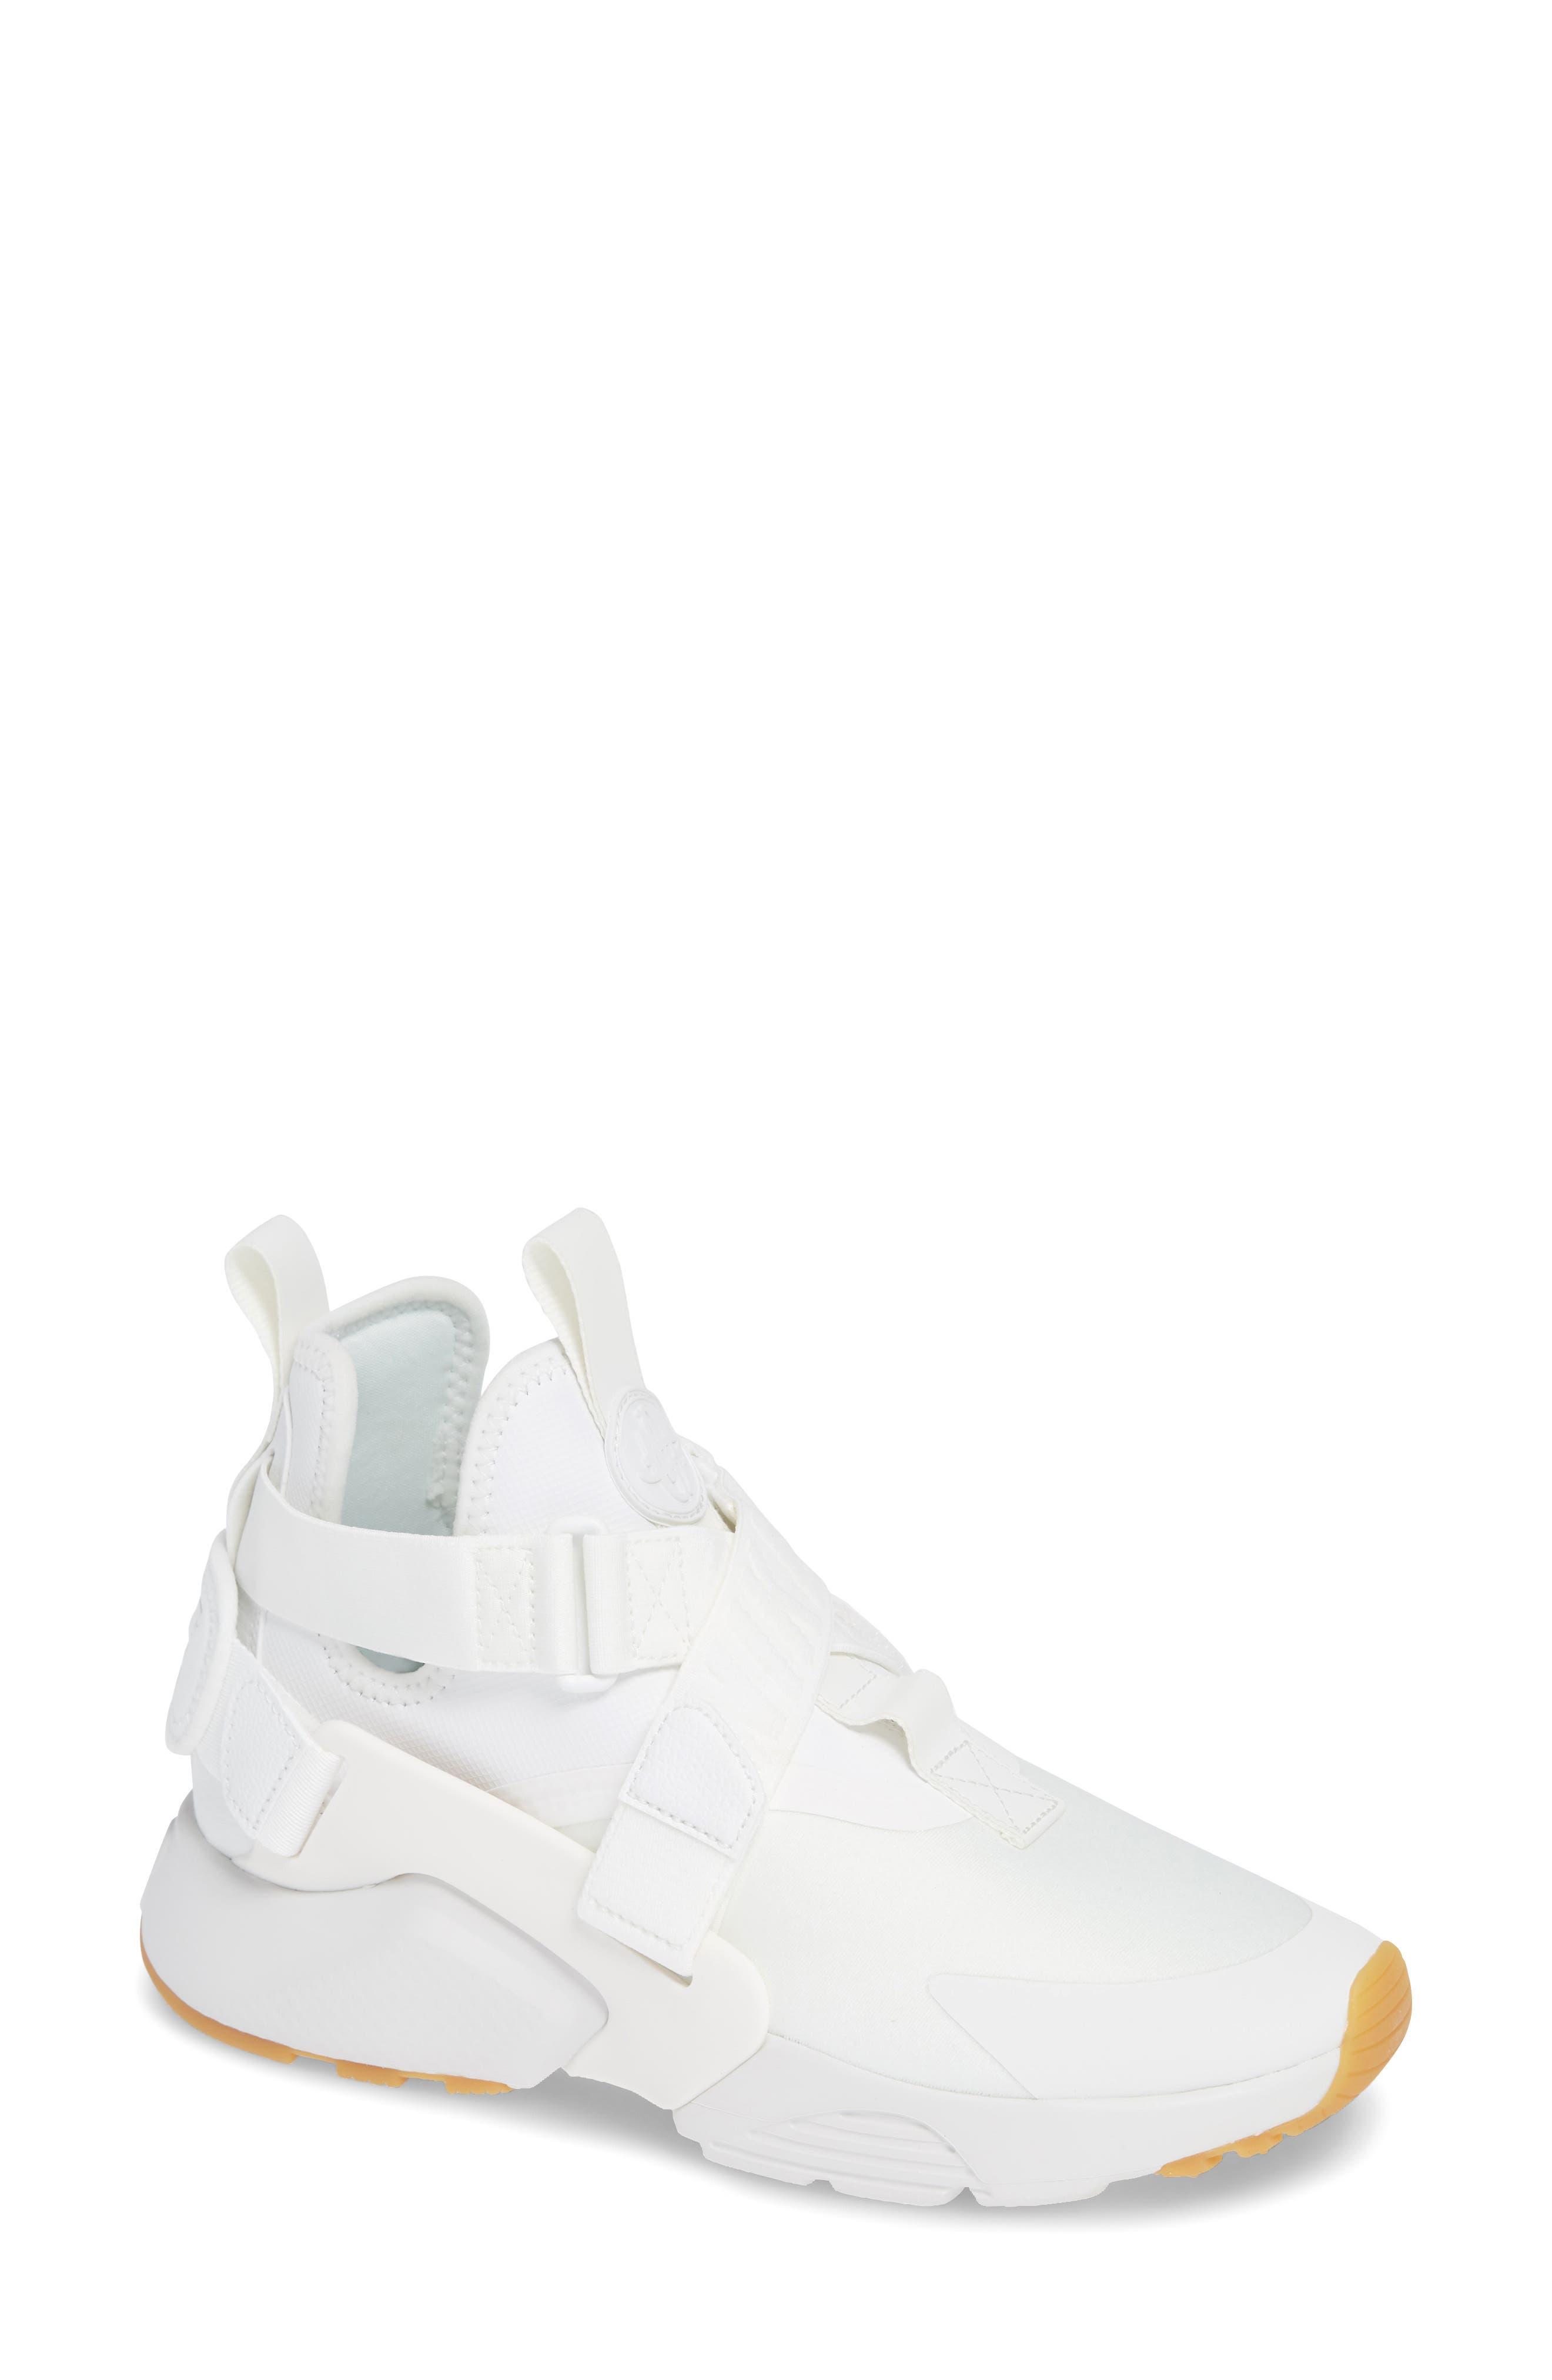 Air Huarache City Sneaker,                         Main,                         color, 104